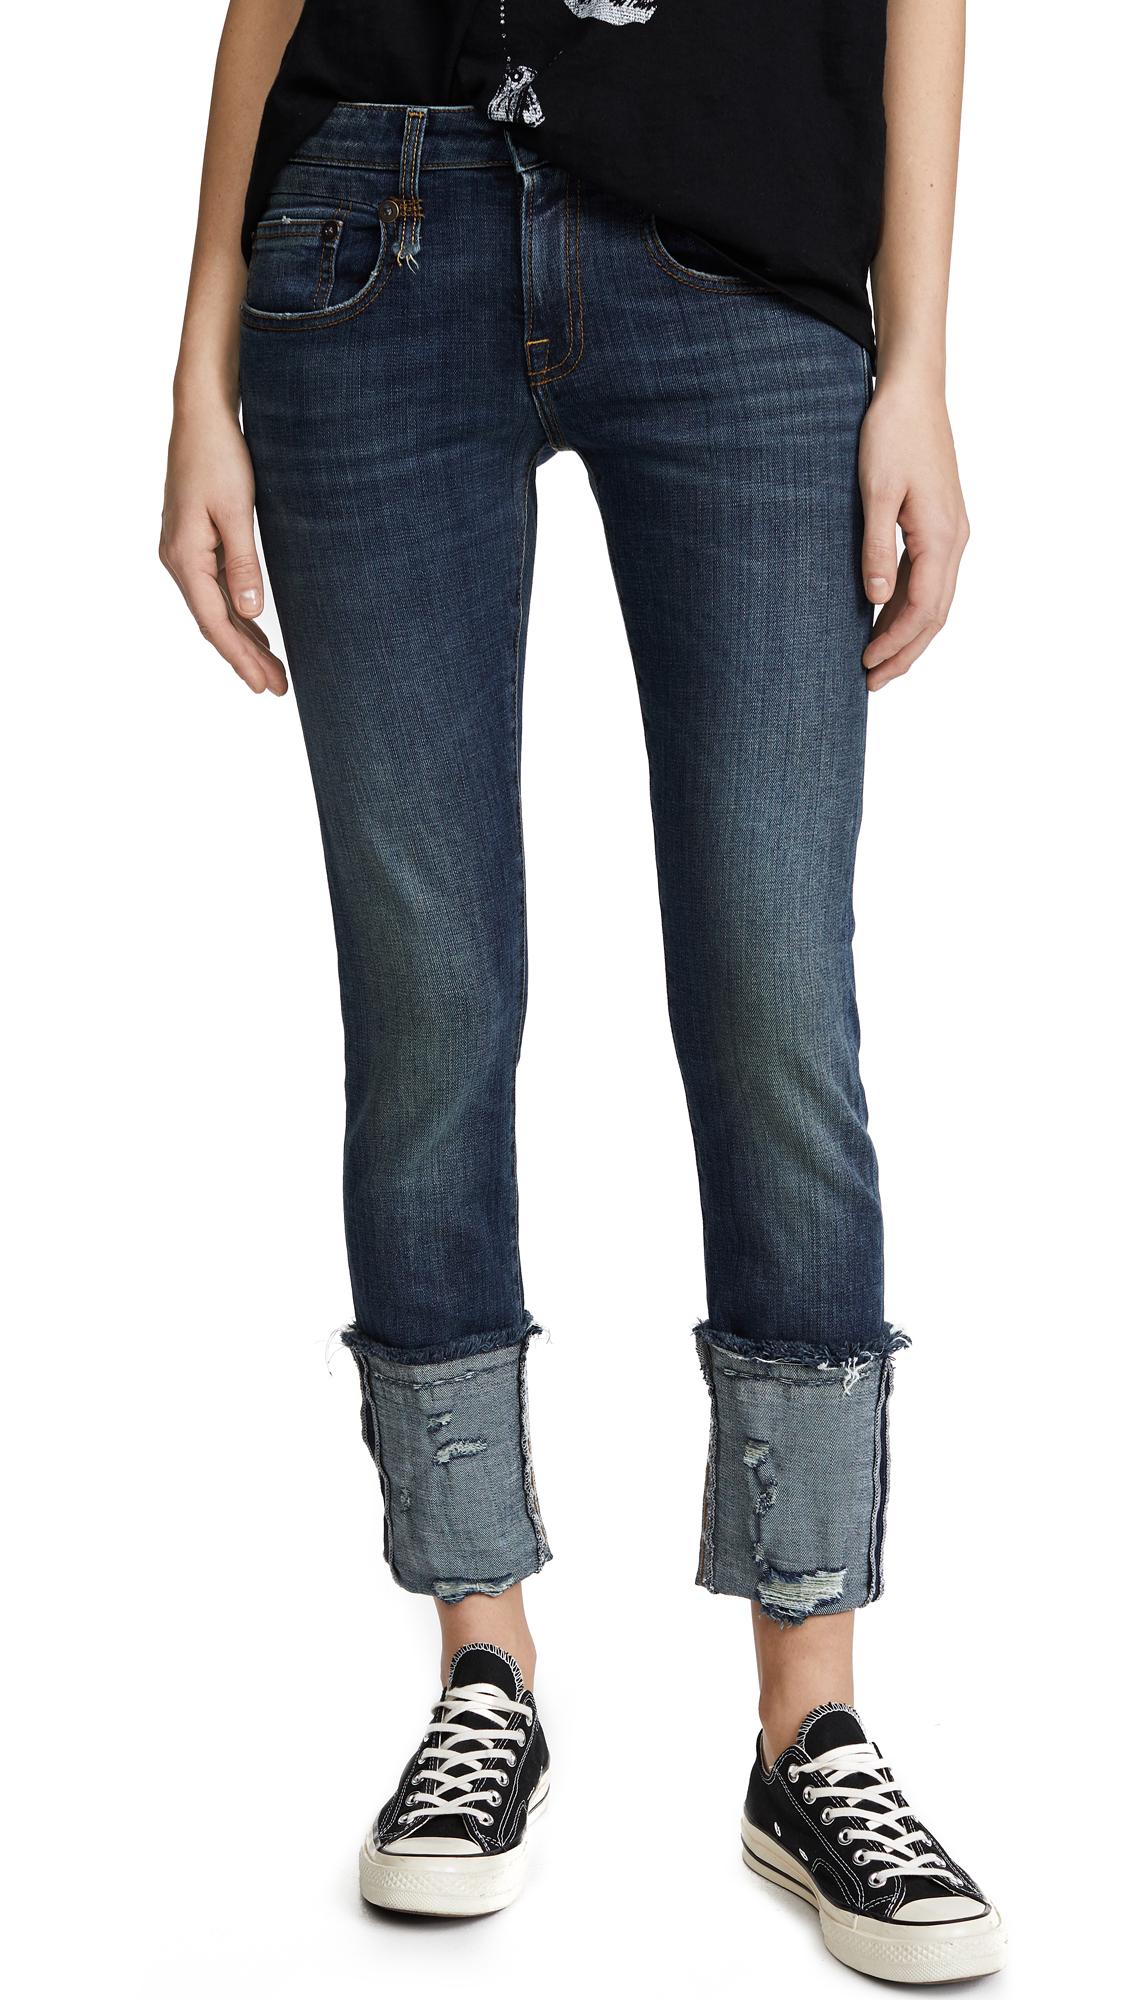 R13 Boy Skinny Jeans with Cuffs